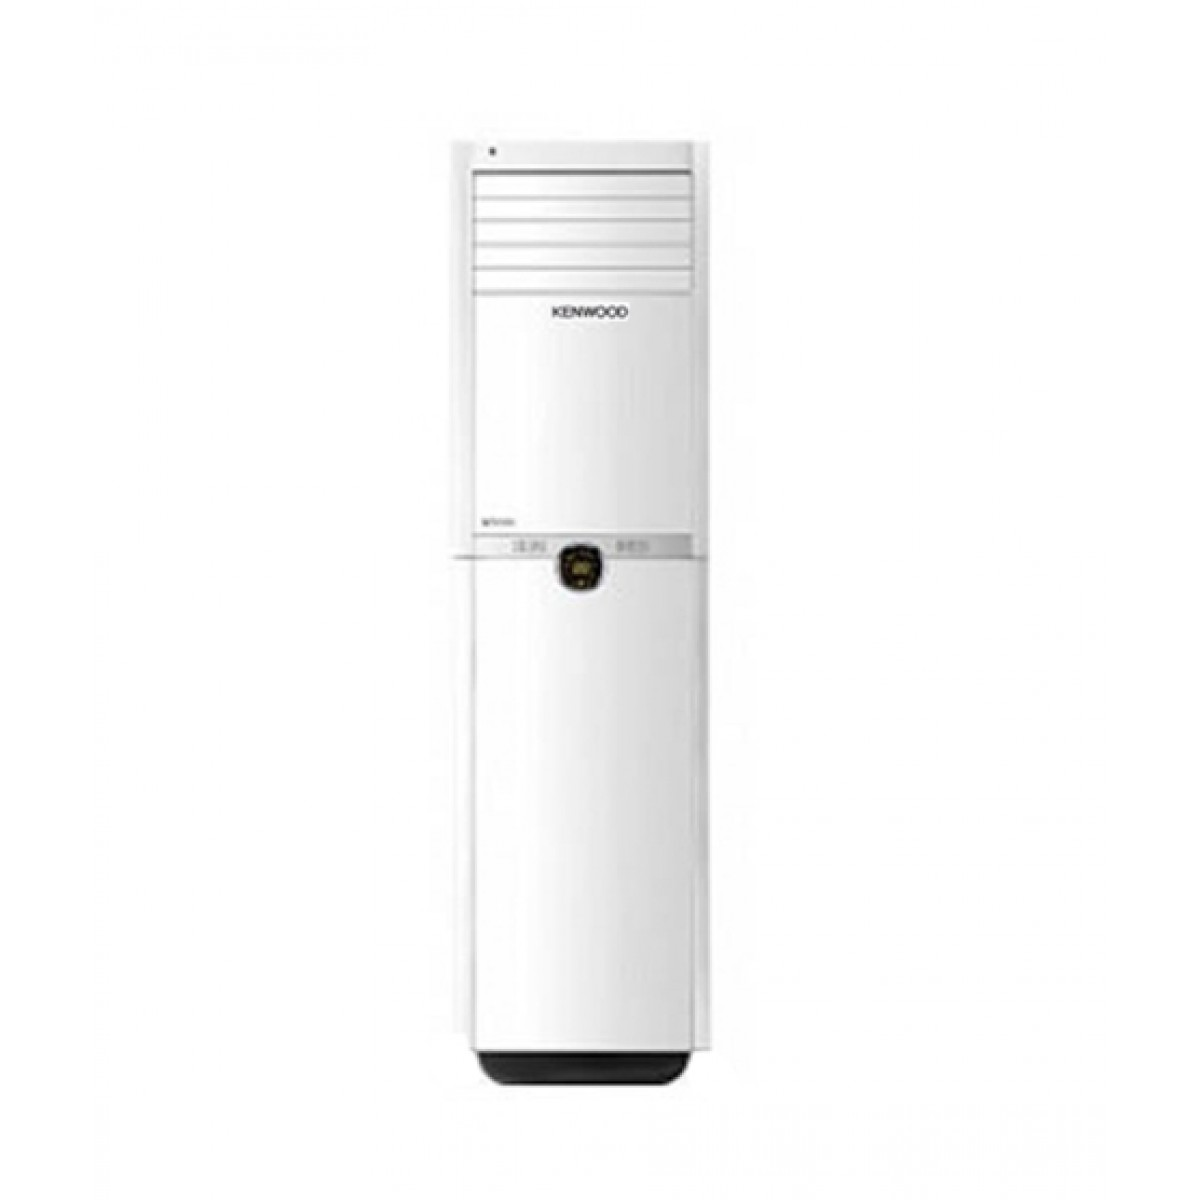 Kenwood Esense Floor Standing A C 2 0 Ton Price In Pakistan Buy Kenwood Floor Standing Air Conditioner Kee 2400f Ishopping Pk